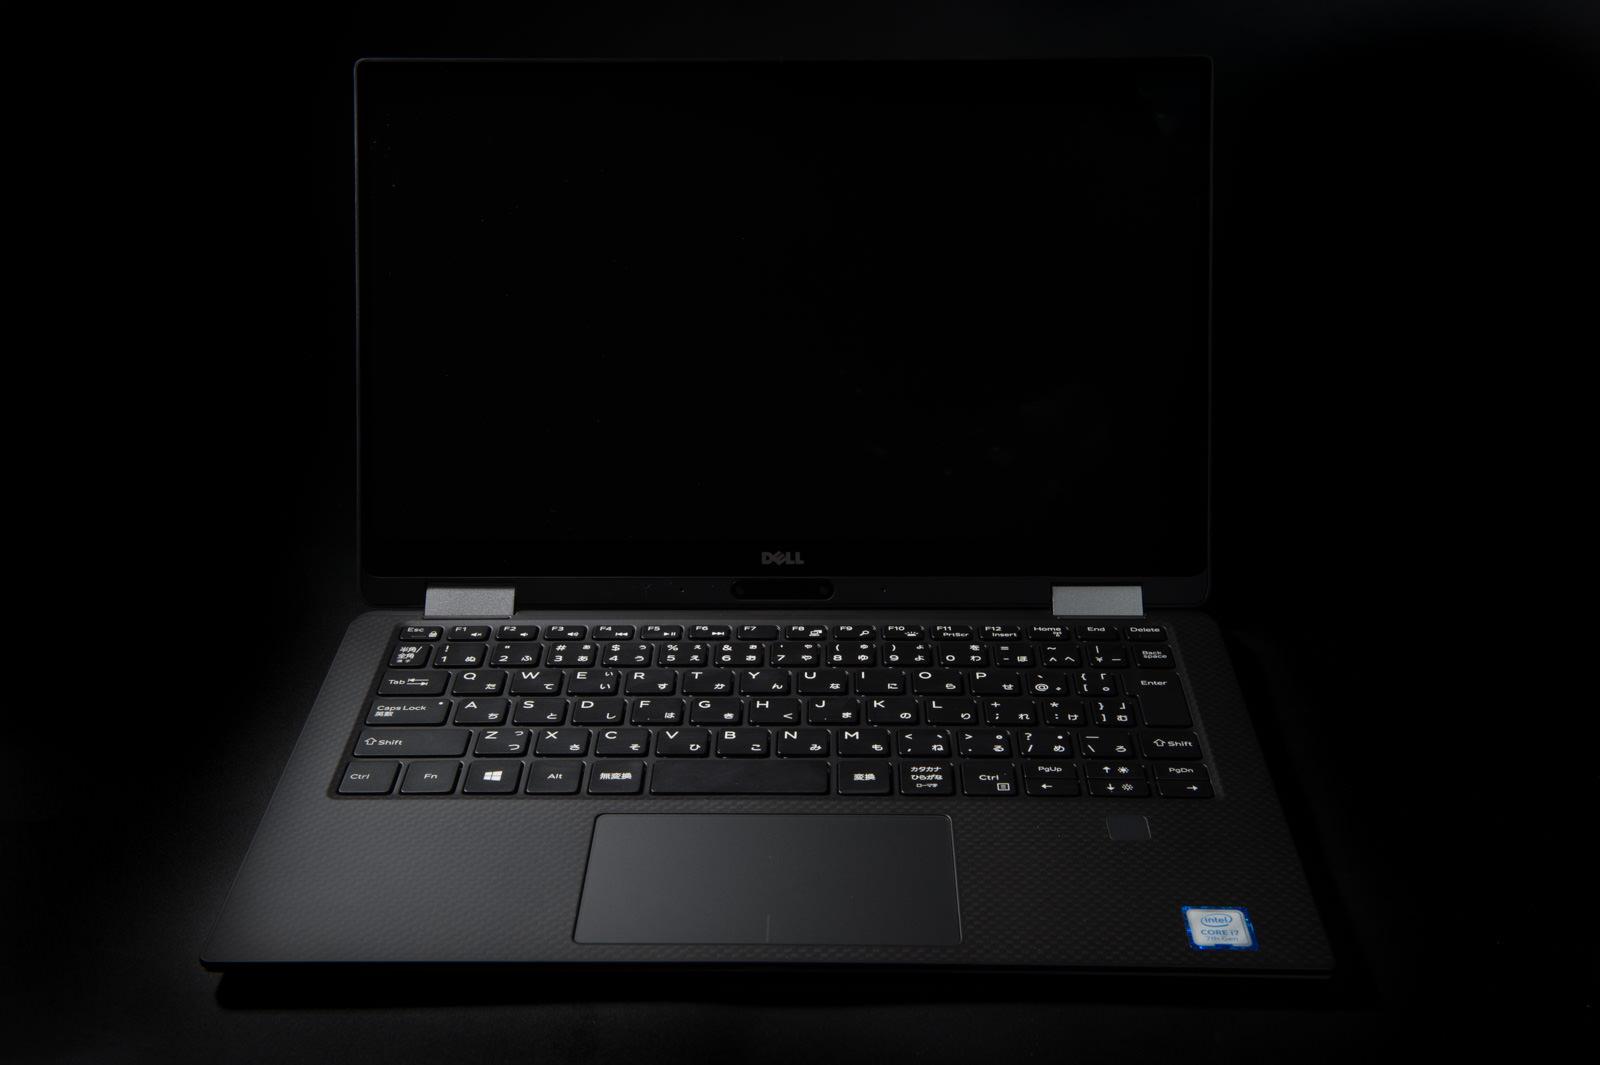 xps13-2-in-1-PCモード